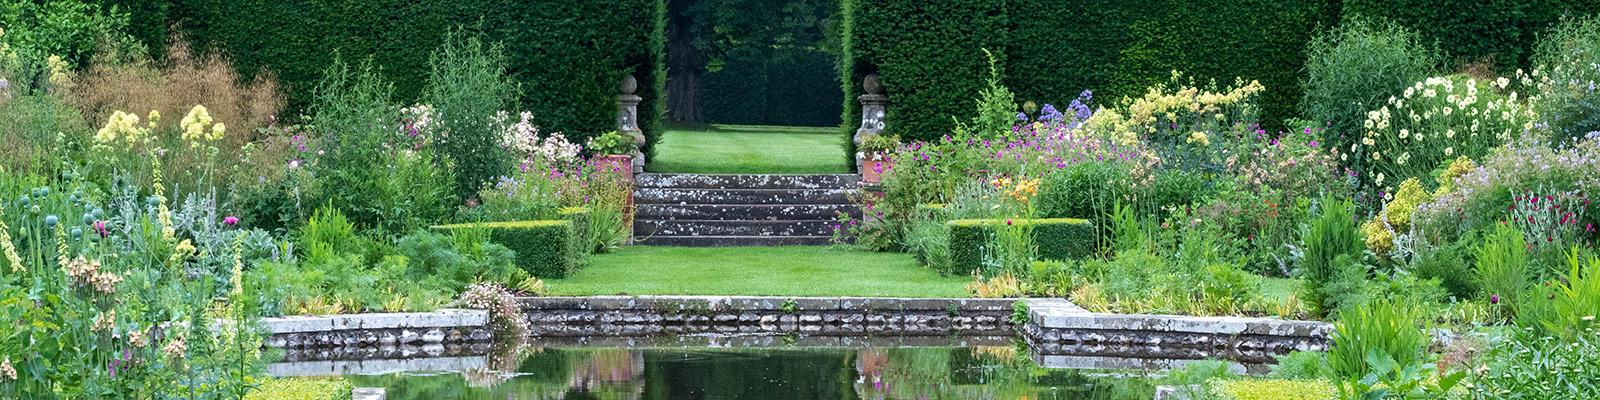 Doddington Place Gardens - The Sunken Garden